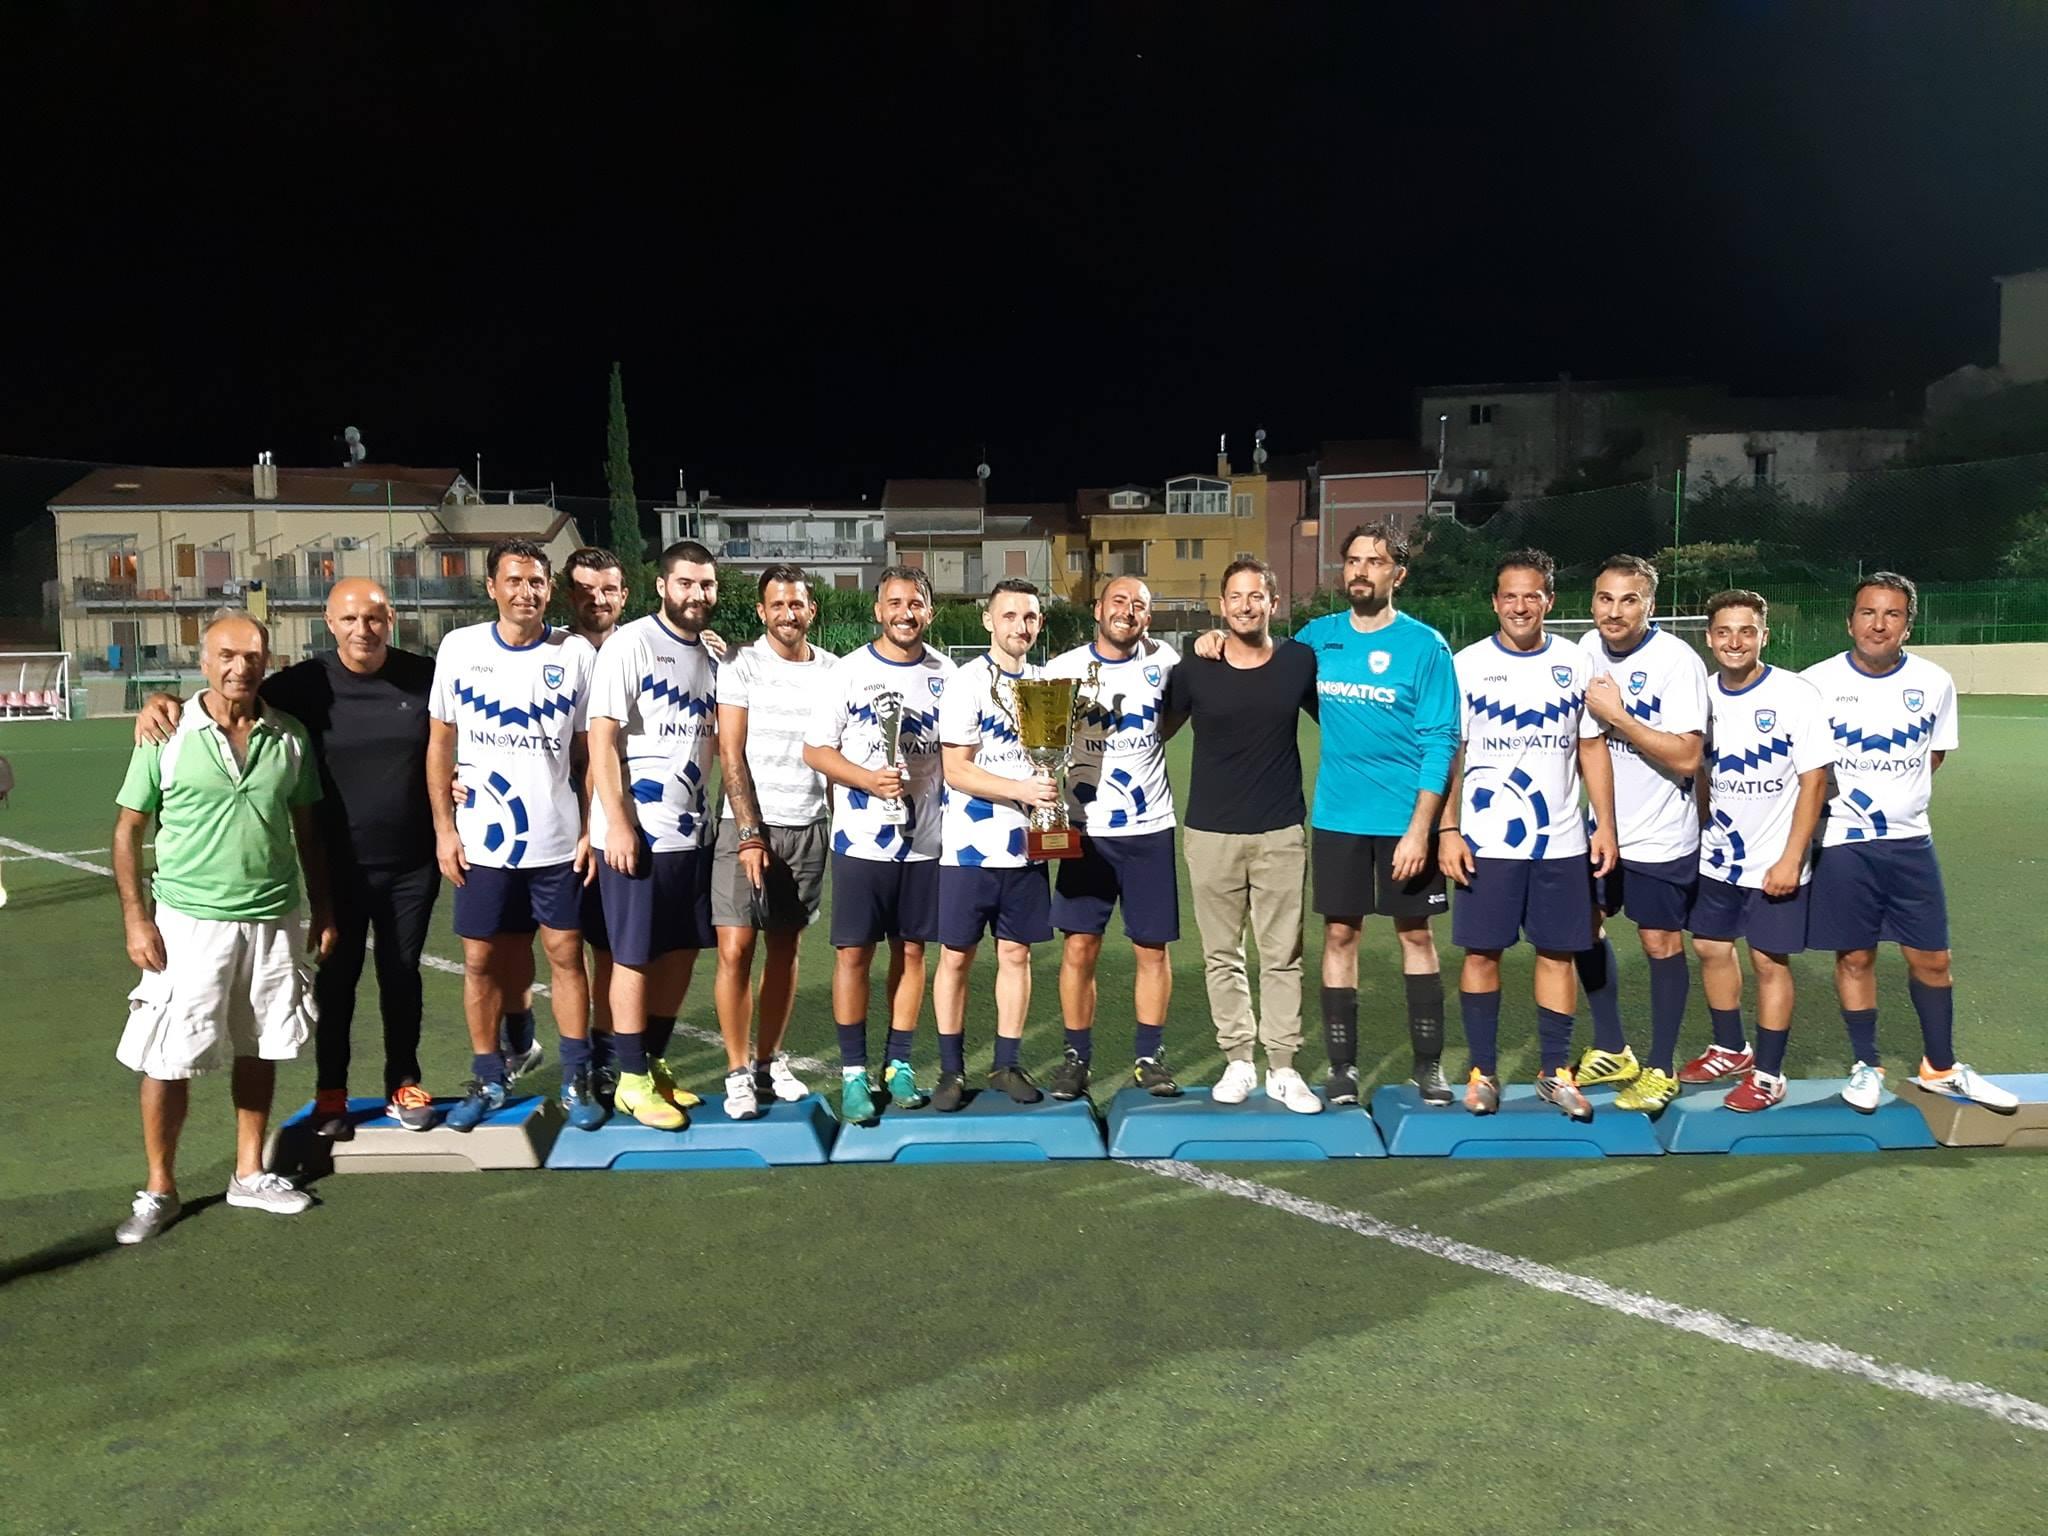 Salerno Guiscards Calcio